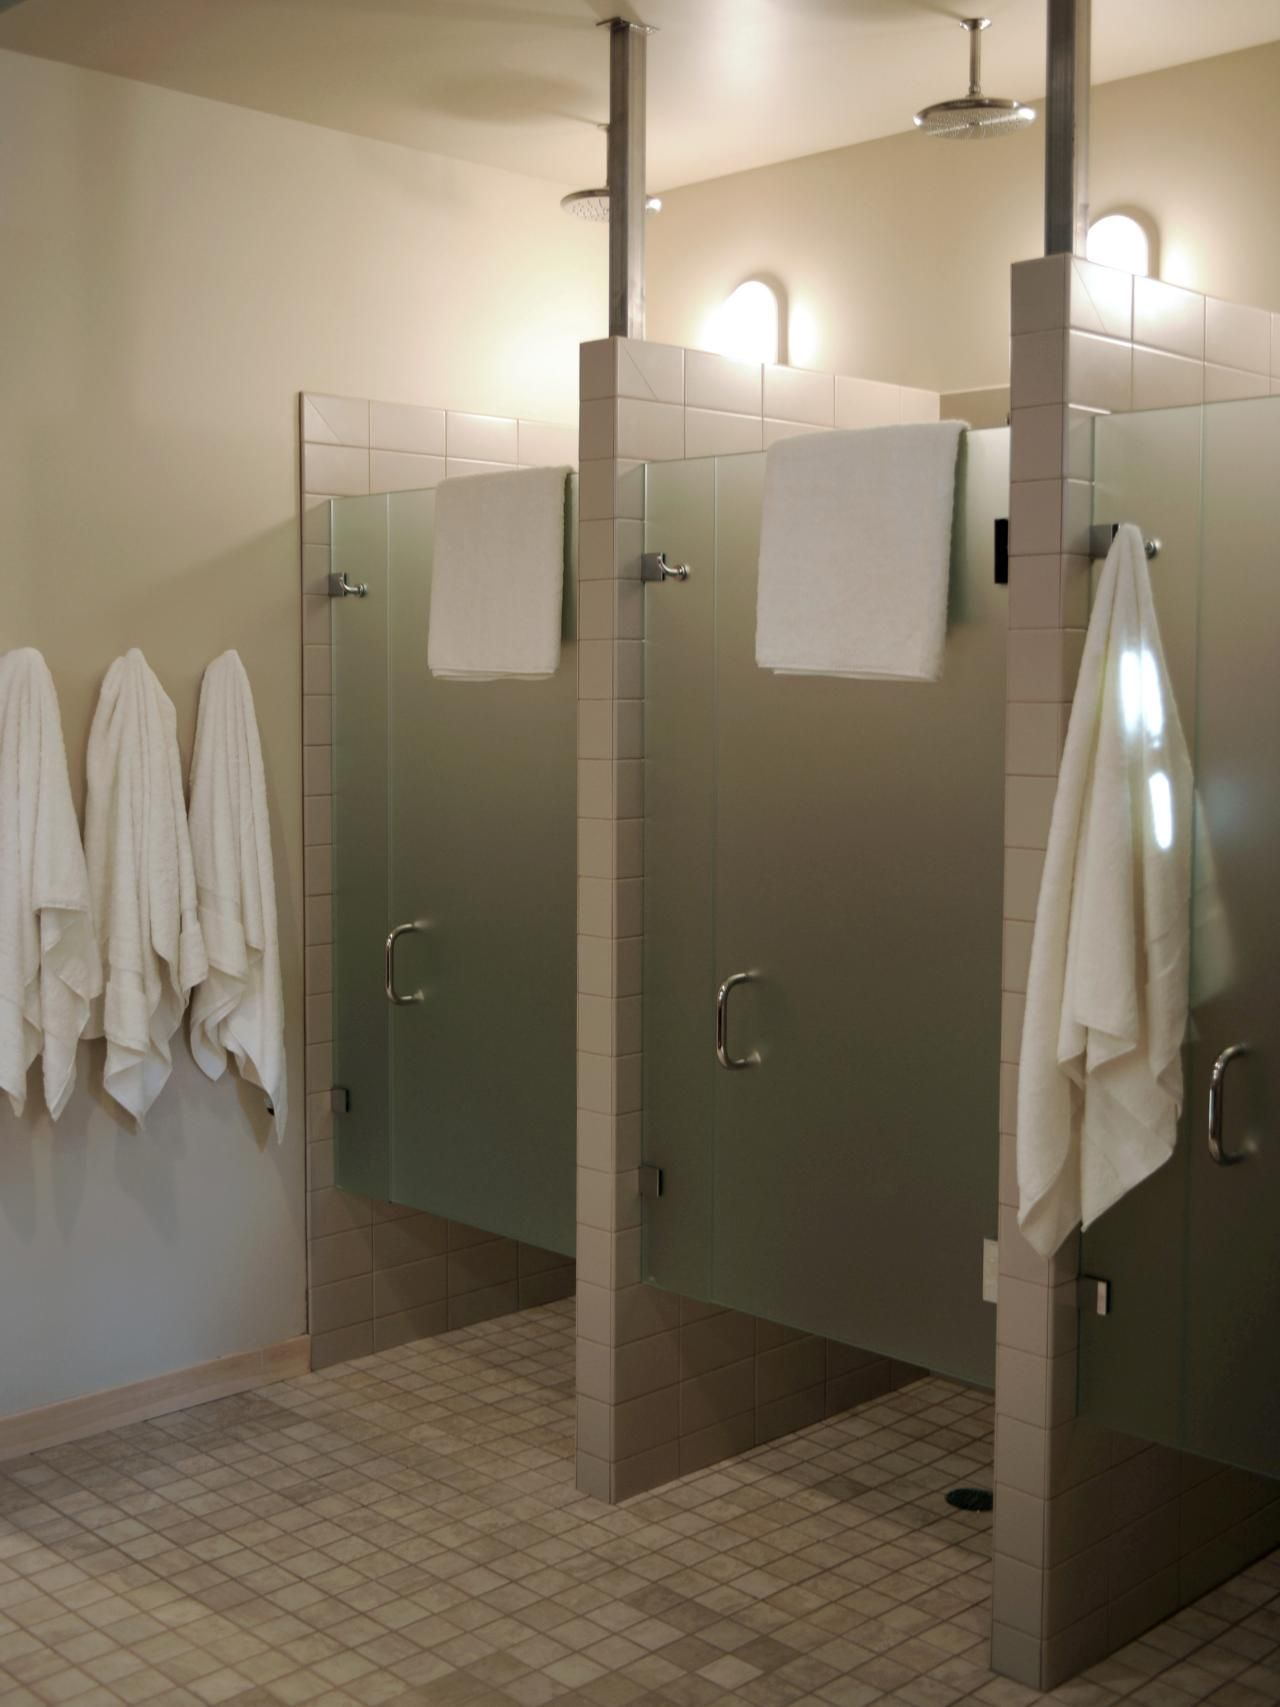 Dream Home 2011 Ski Dorm Bathroom | Dorm bathroom, Tile flooring and ...